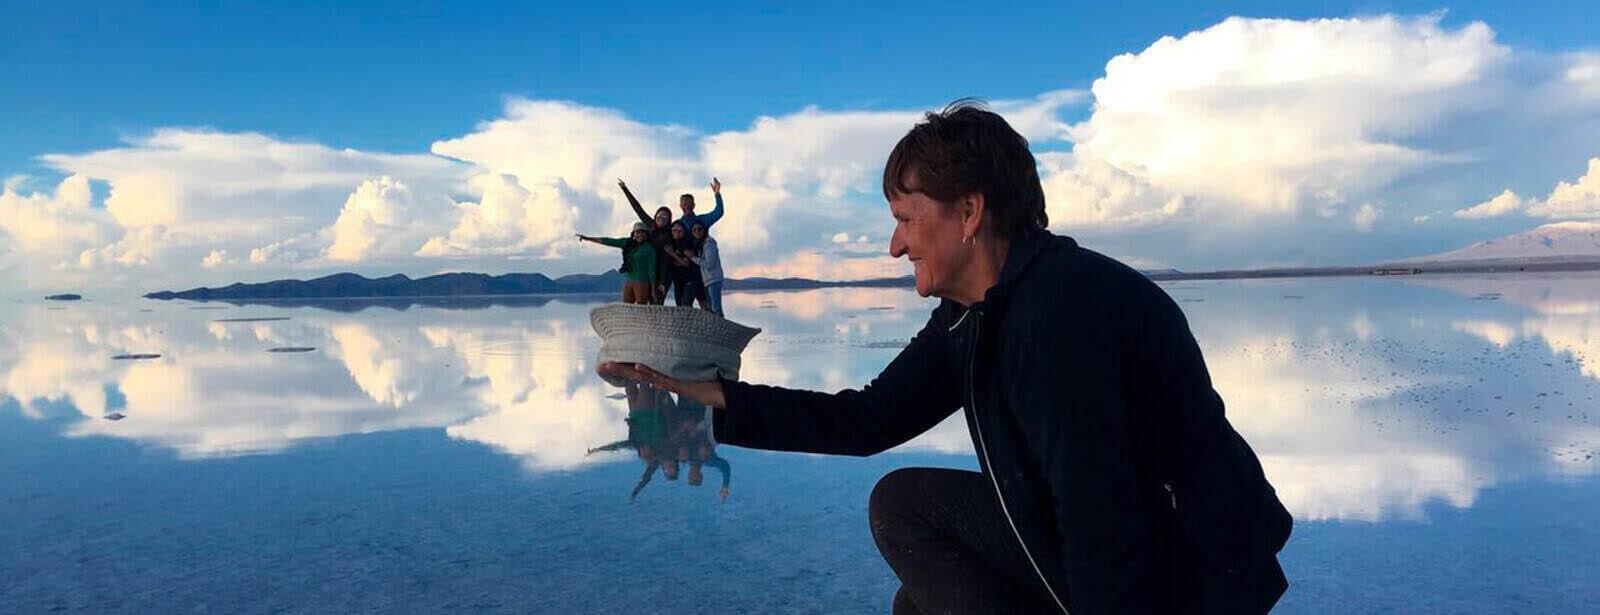 Tour Salar de Uyuni en Bolivia con Inca's Paradise Travel Agency - Comfort